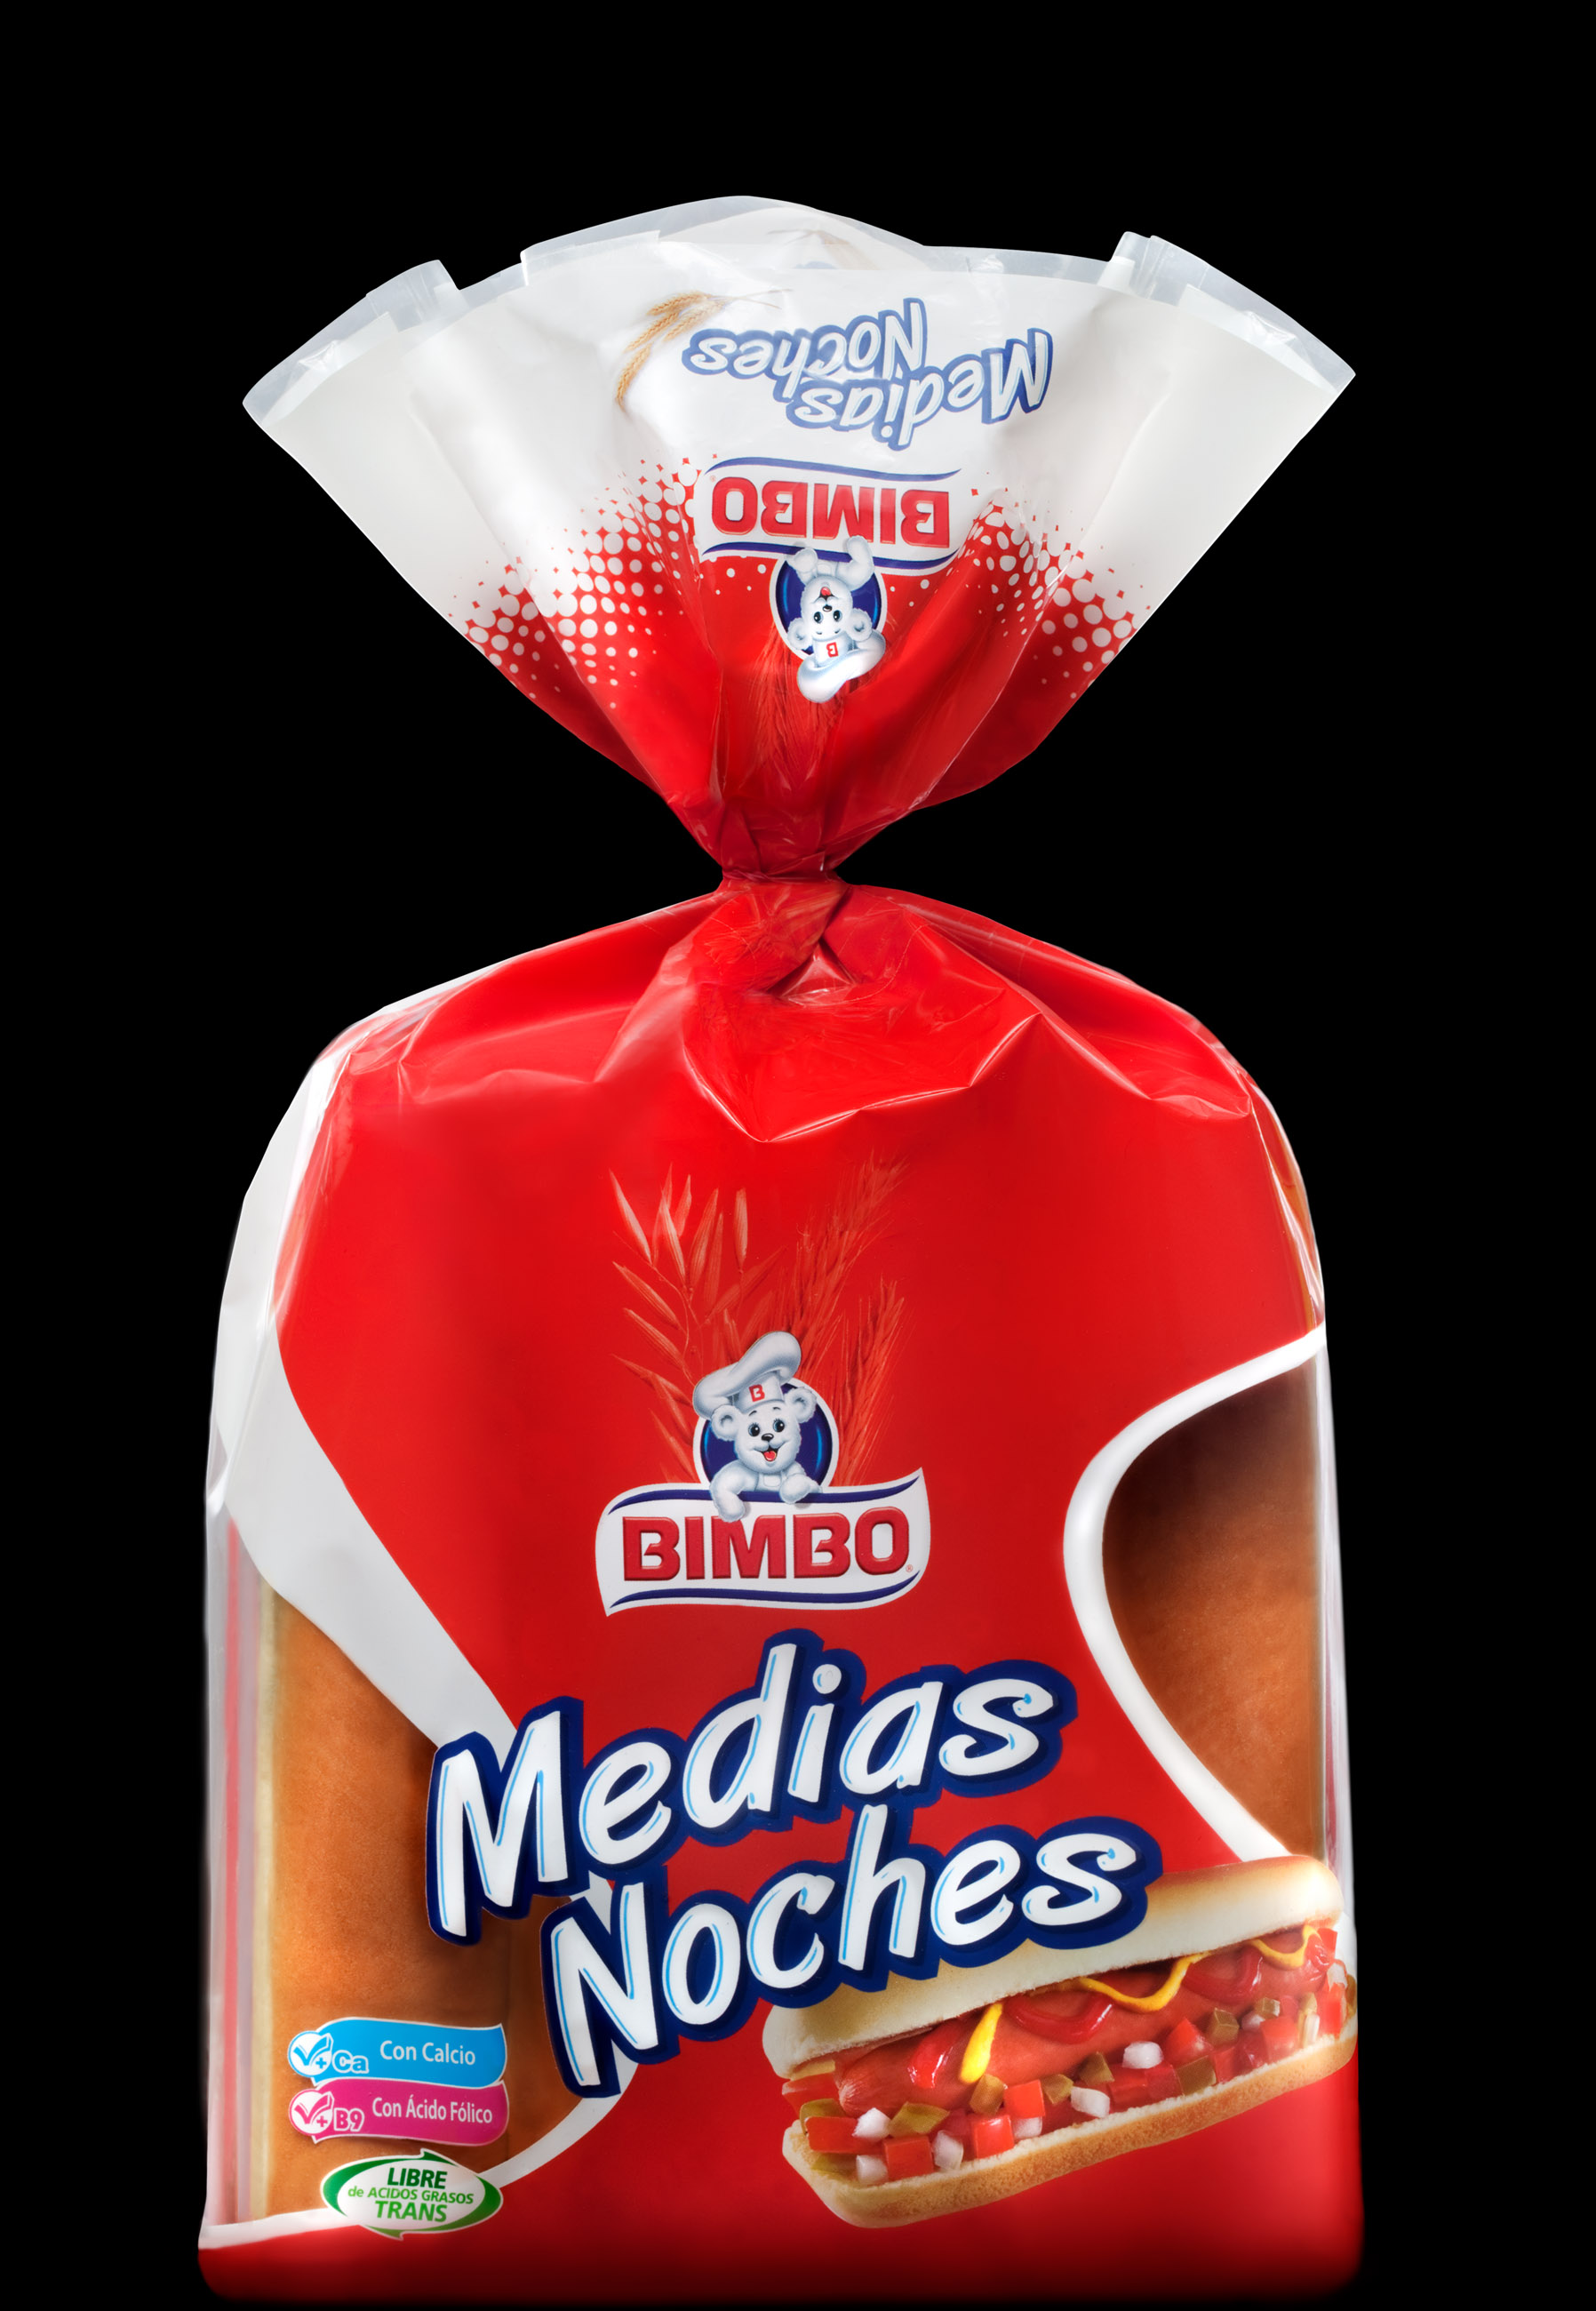 MEDIAS NOCHES BIMBO